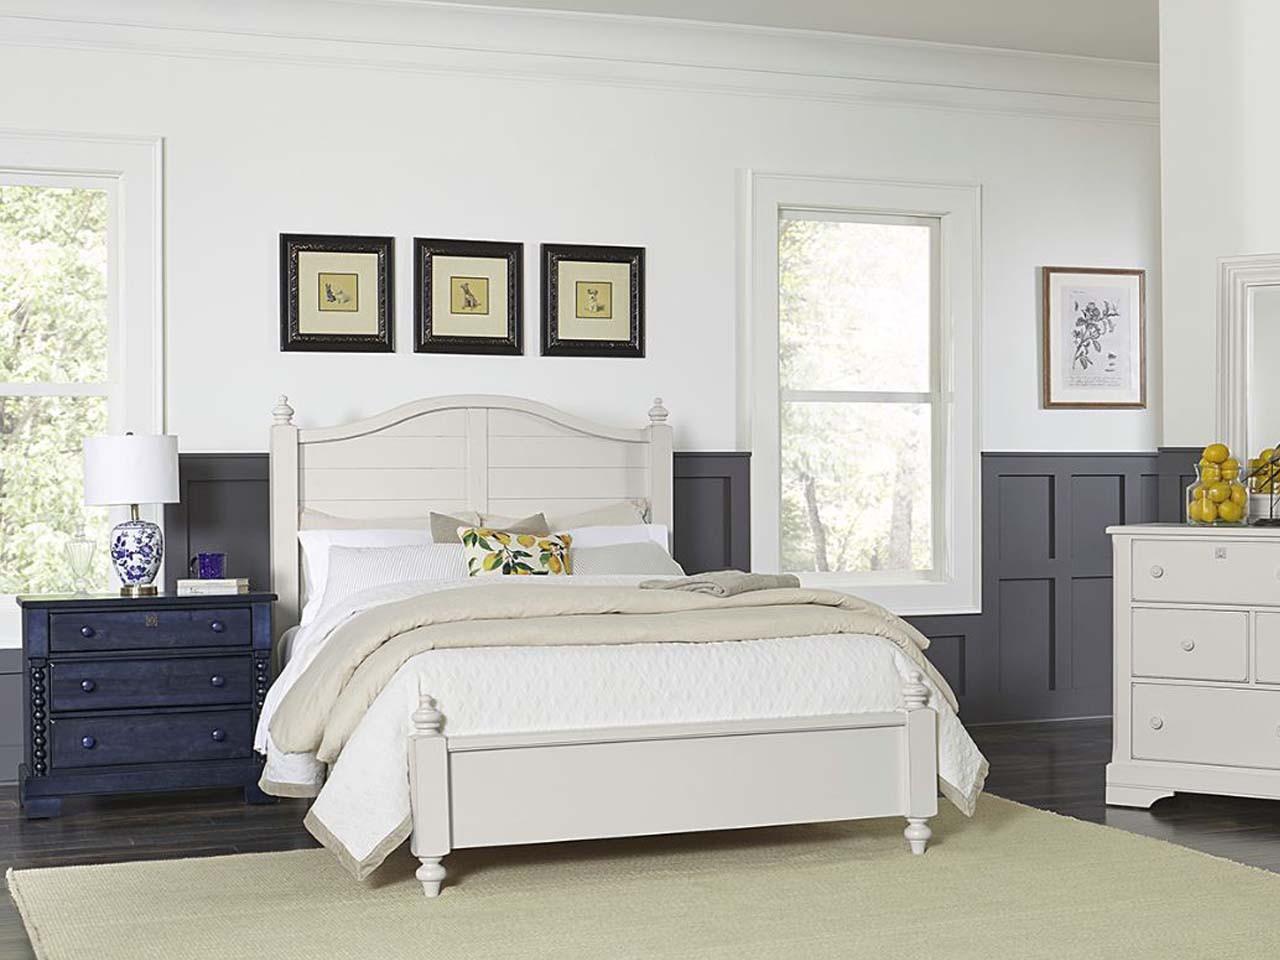 Scotsman Co Panel Bed